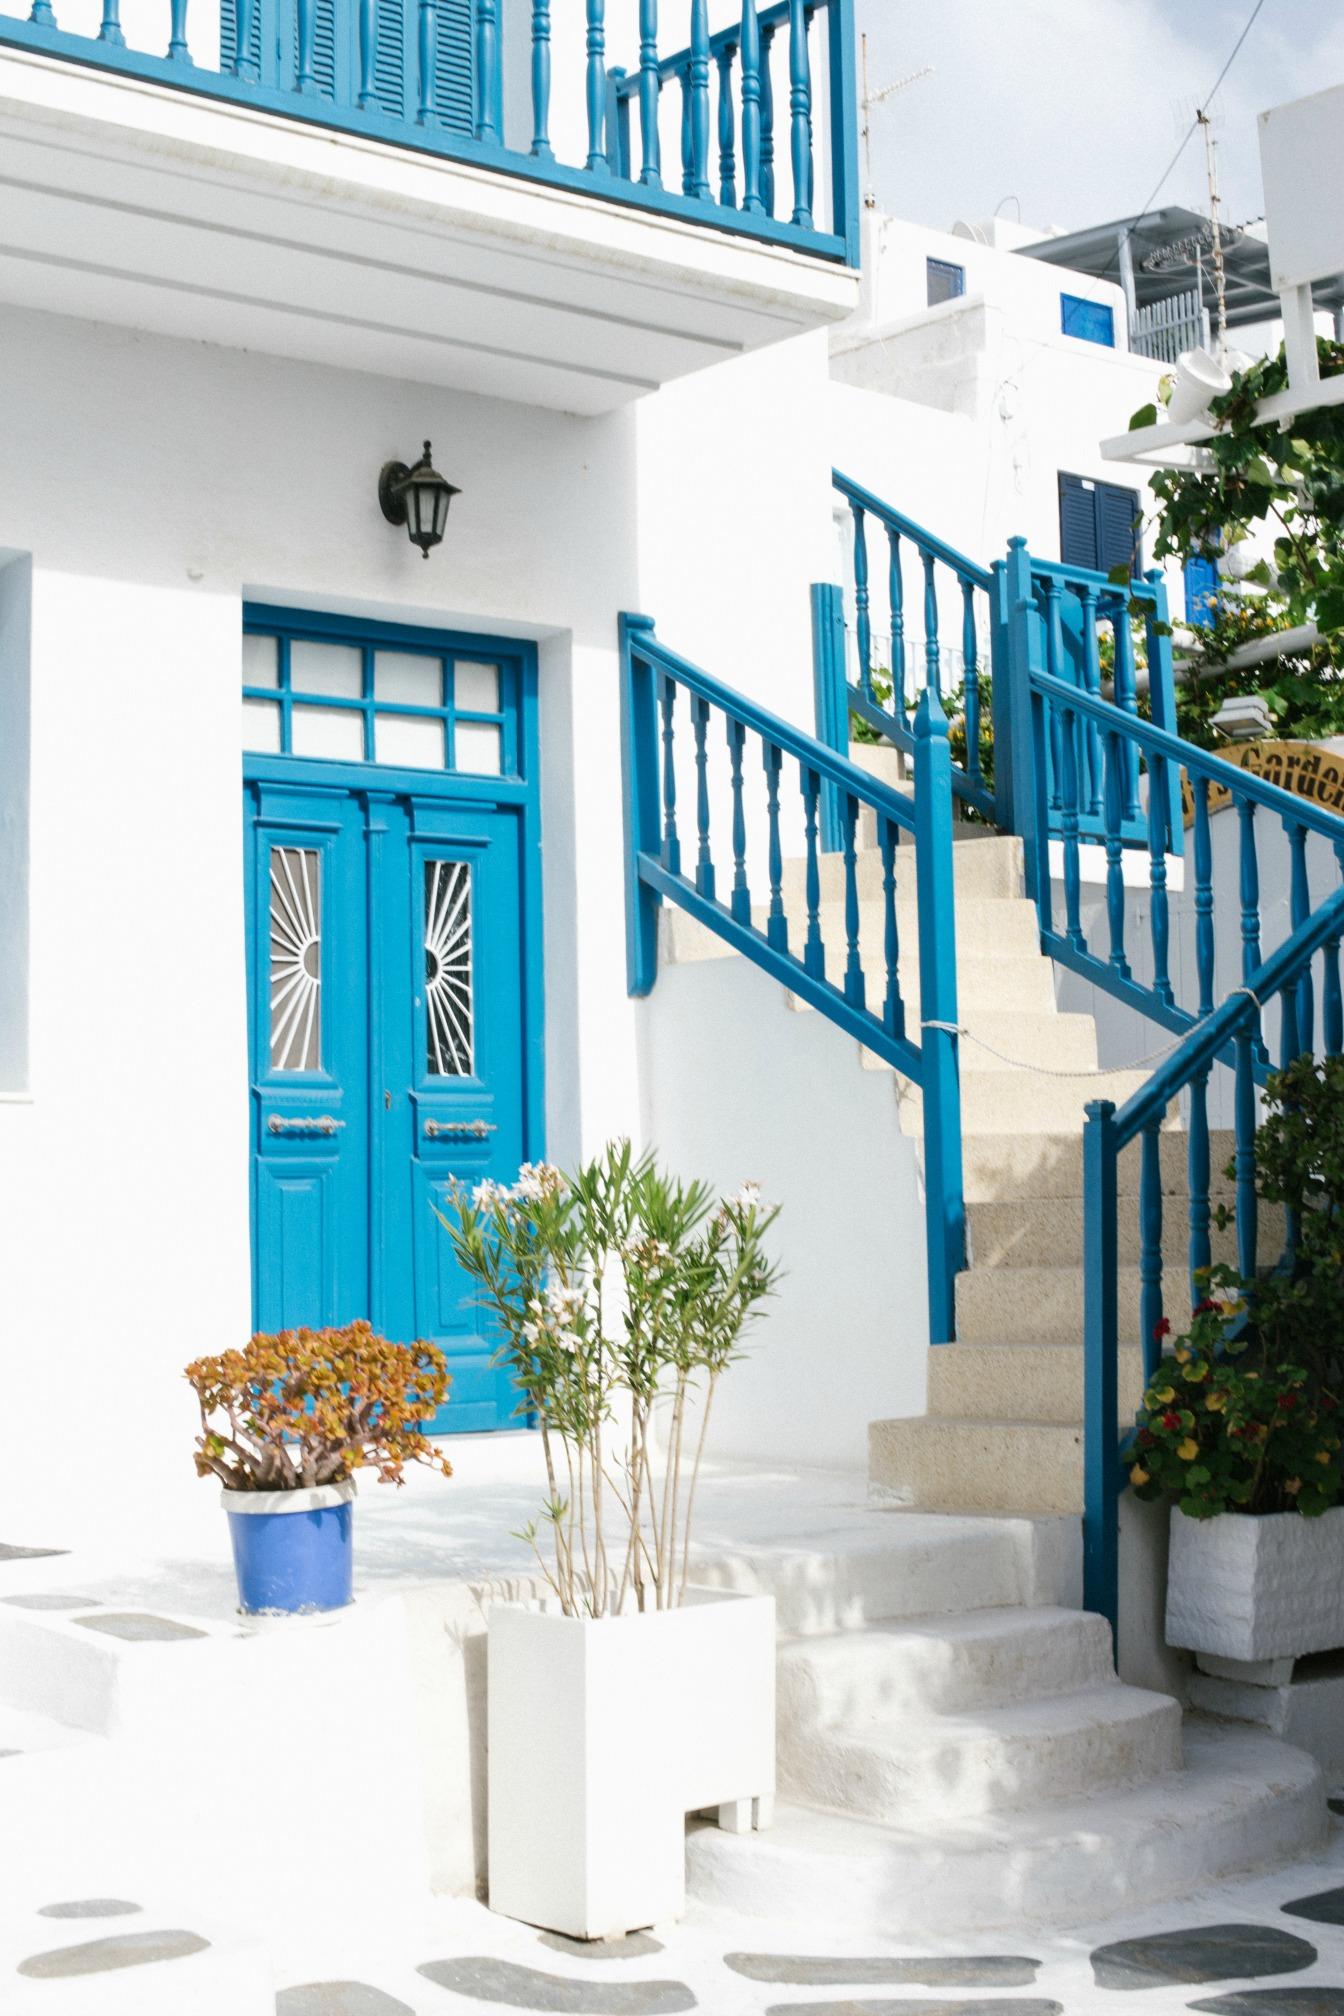 wind-mills-mykonos-town-2016-holidays-vacay-disi-couture-lemon-print-dress-39